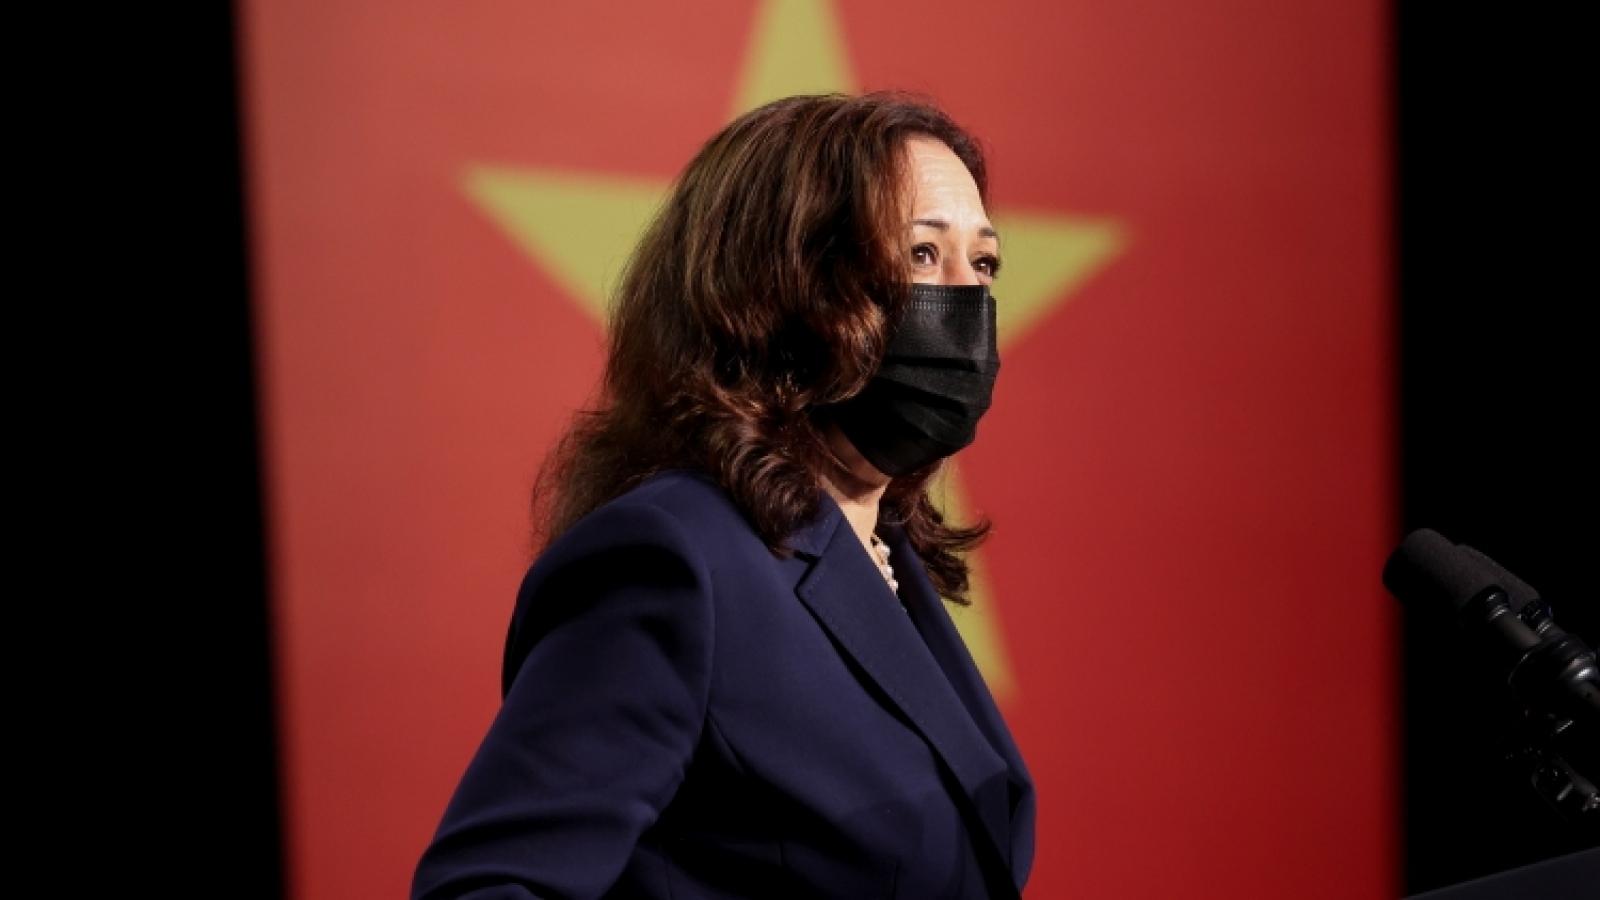 US, Vietnam 'making progress together', says VP Harris